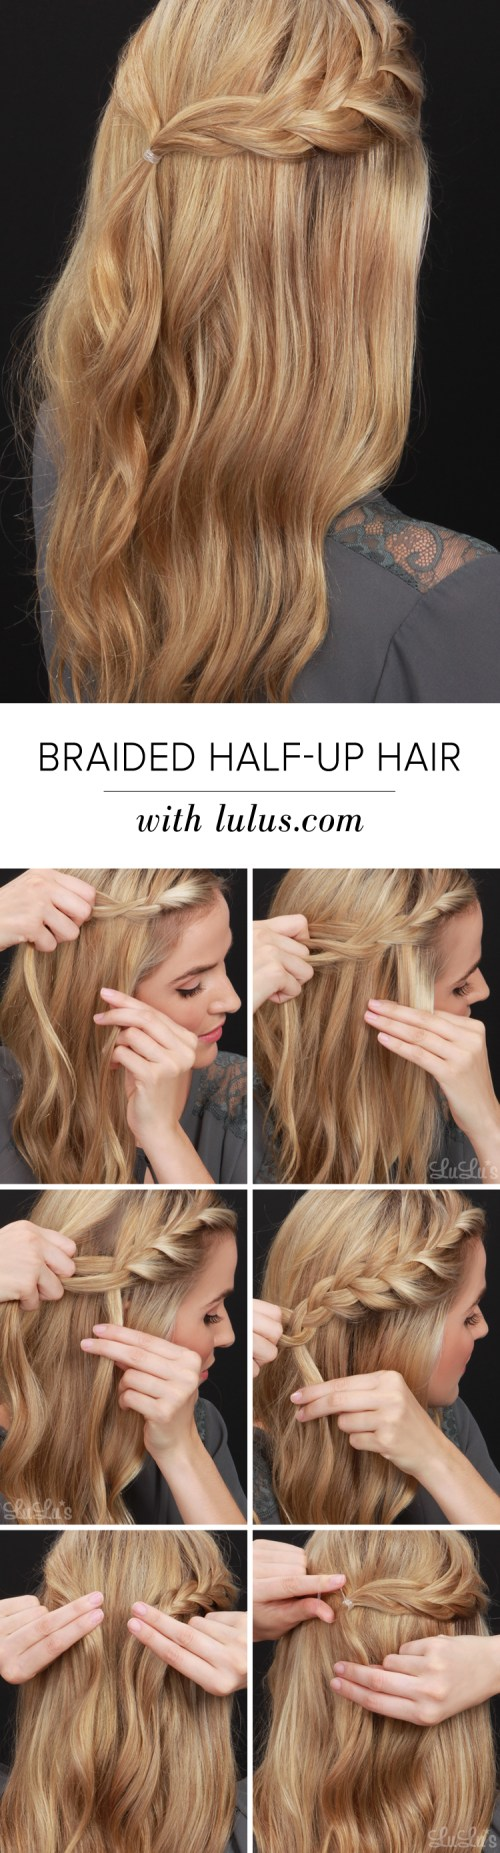 Braided half up hair